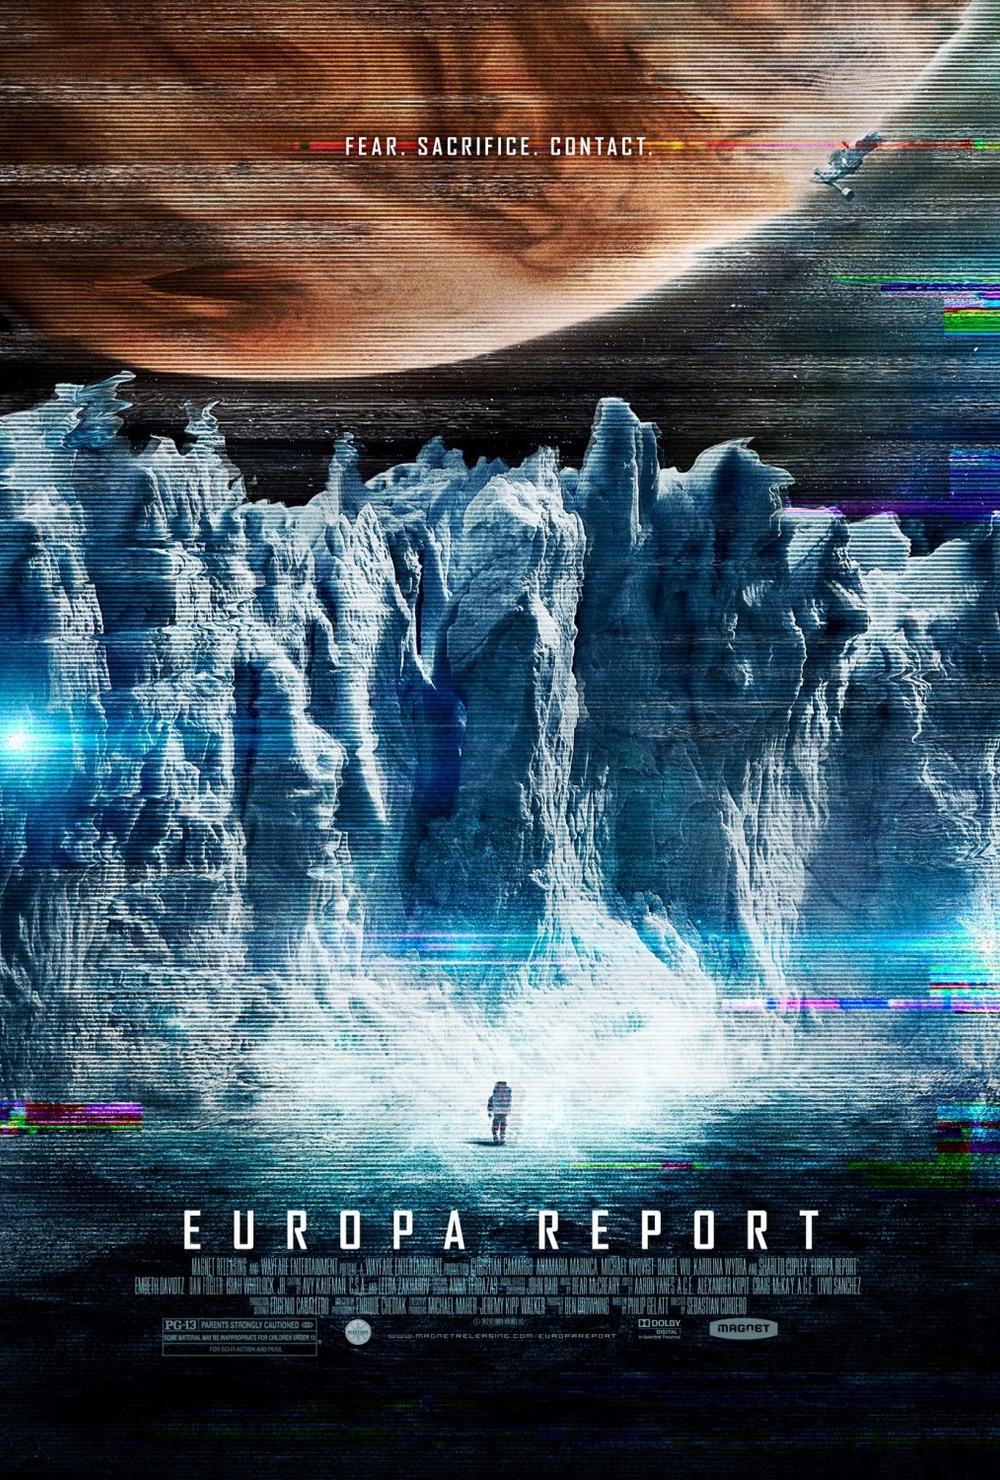 europa_report_xlg.jpg